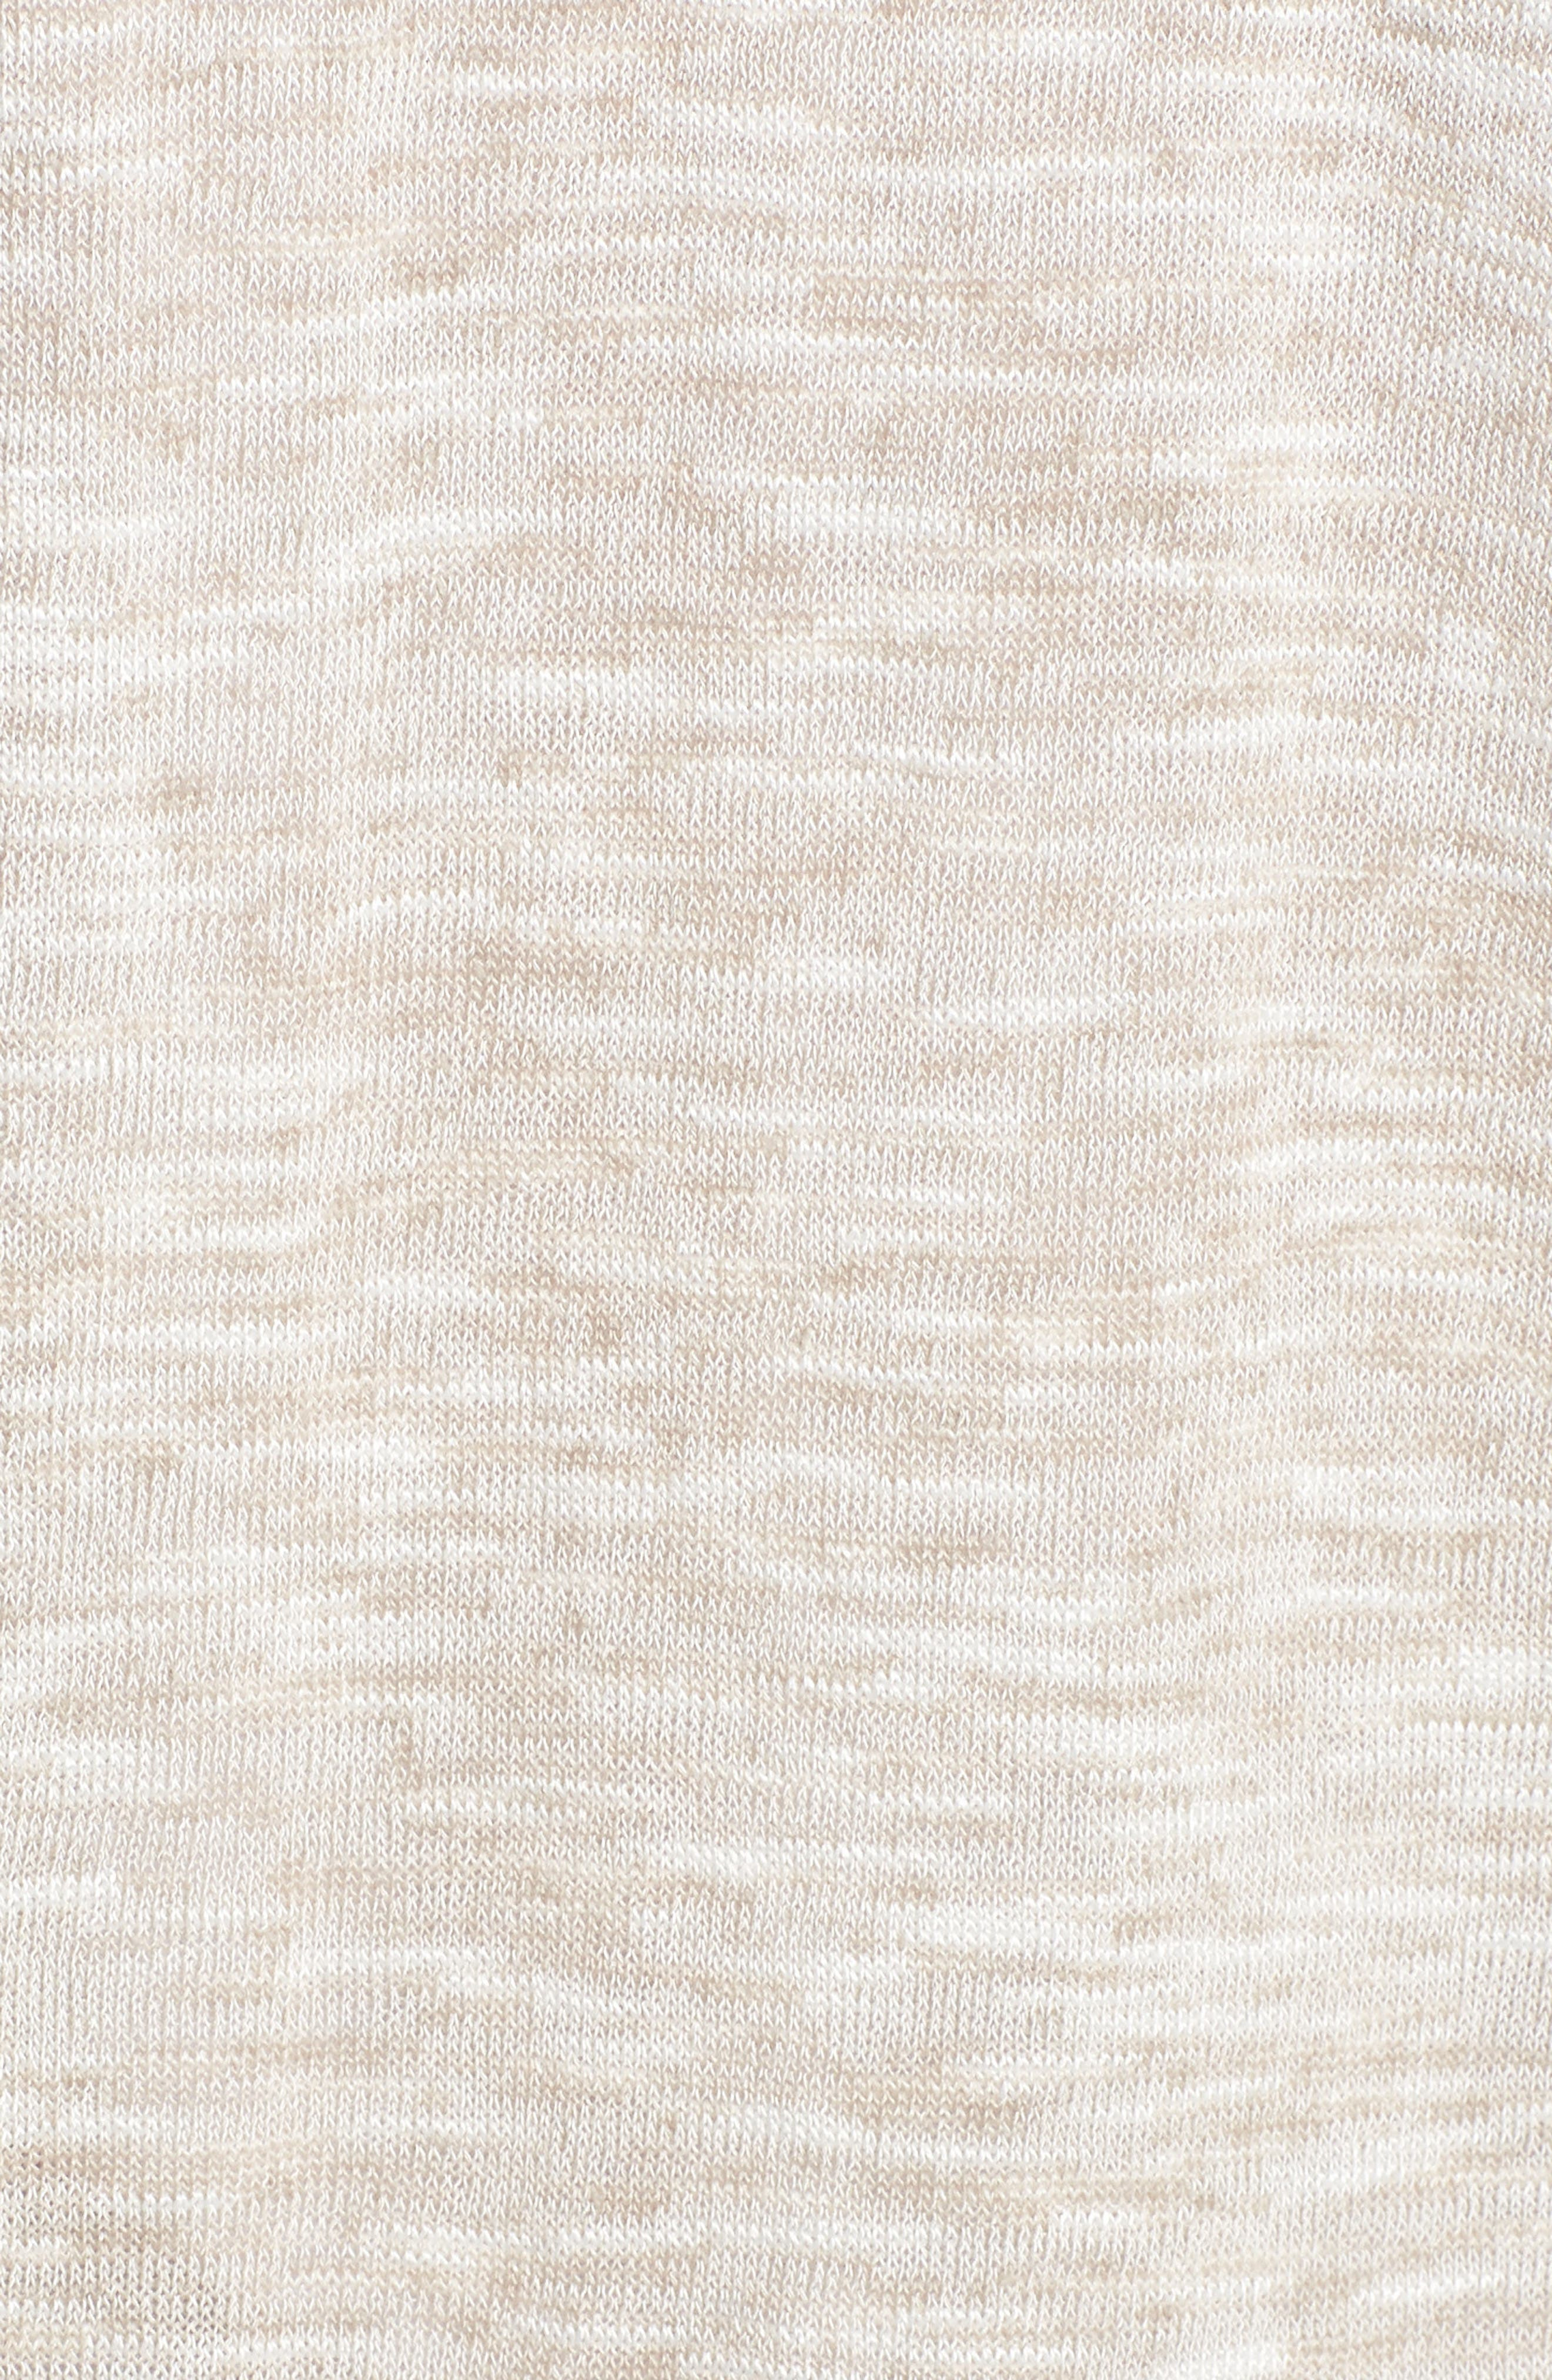 Ruched Sleeve Cardigan,                             Alternate thumbnail 5, color,                             Beige Linen- White Slubs